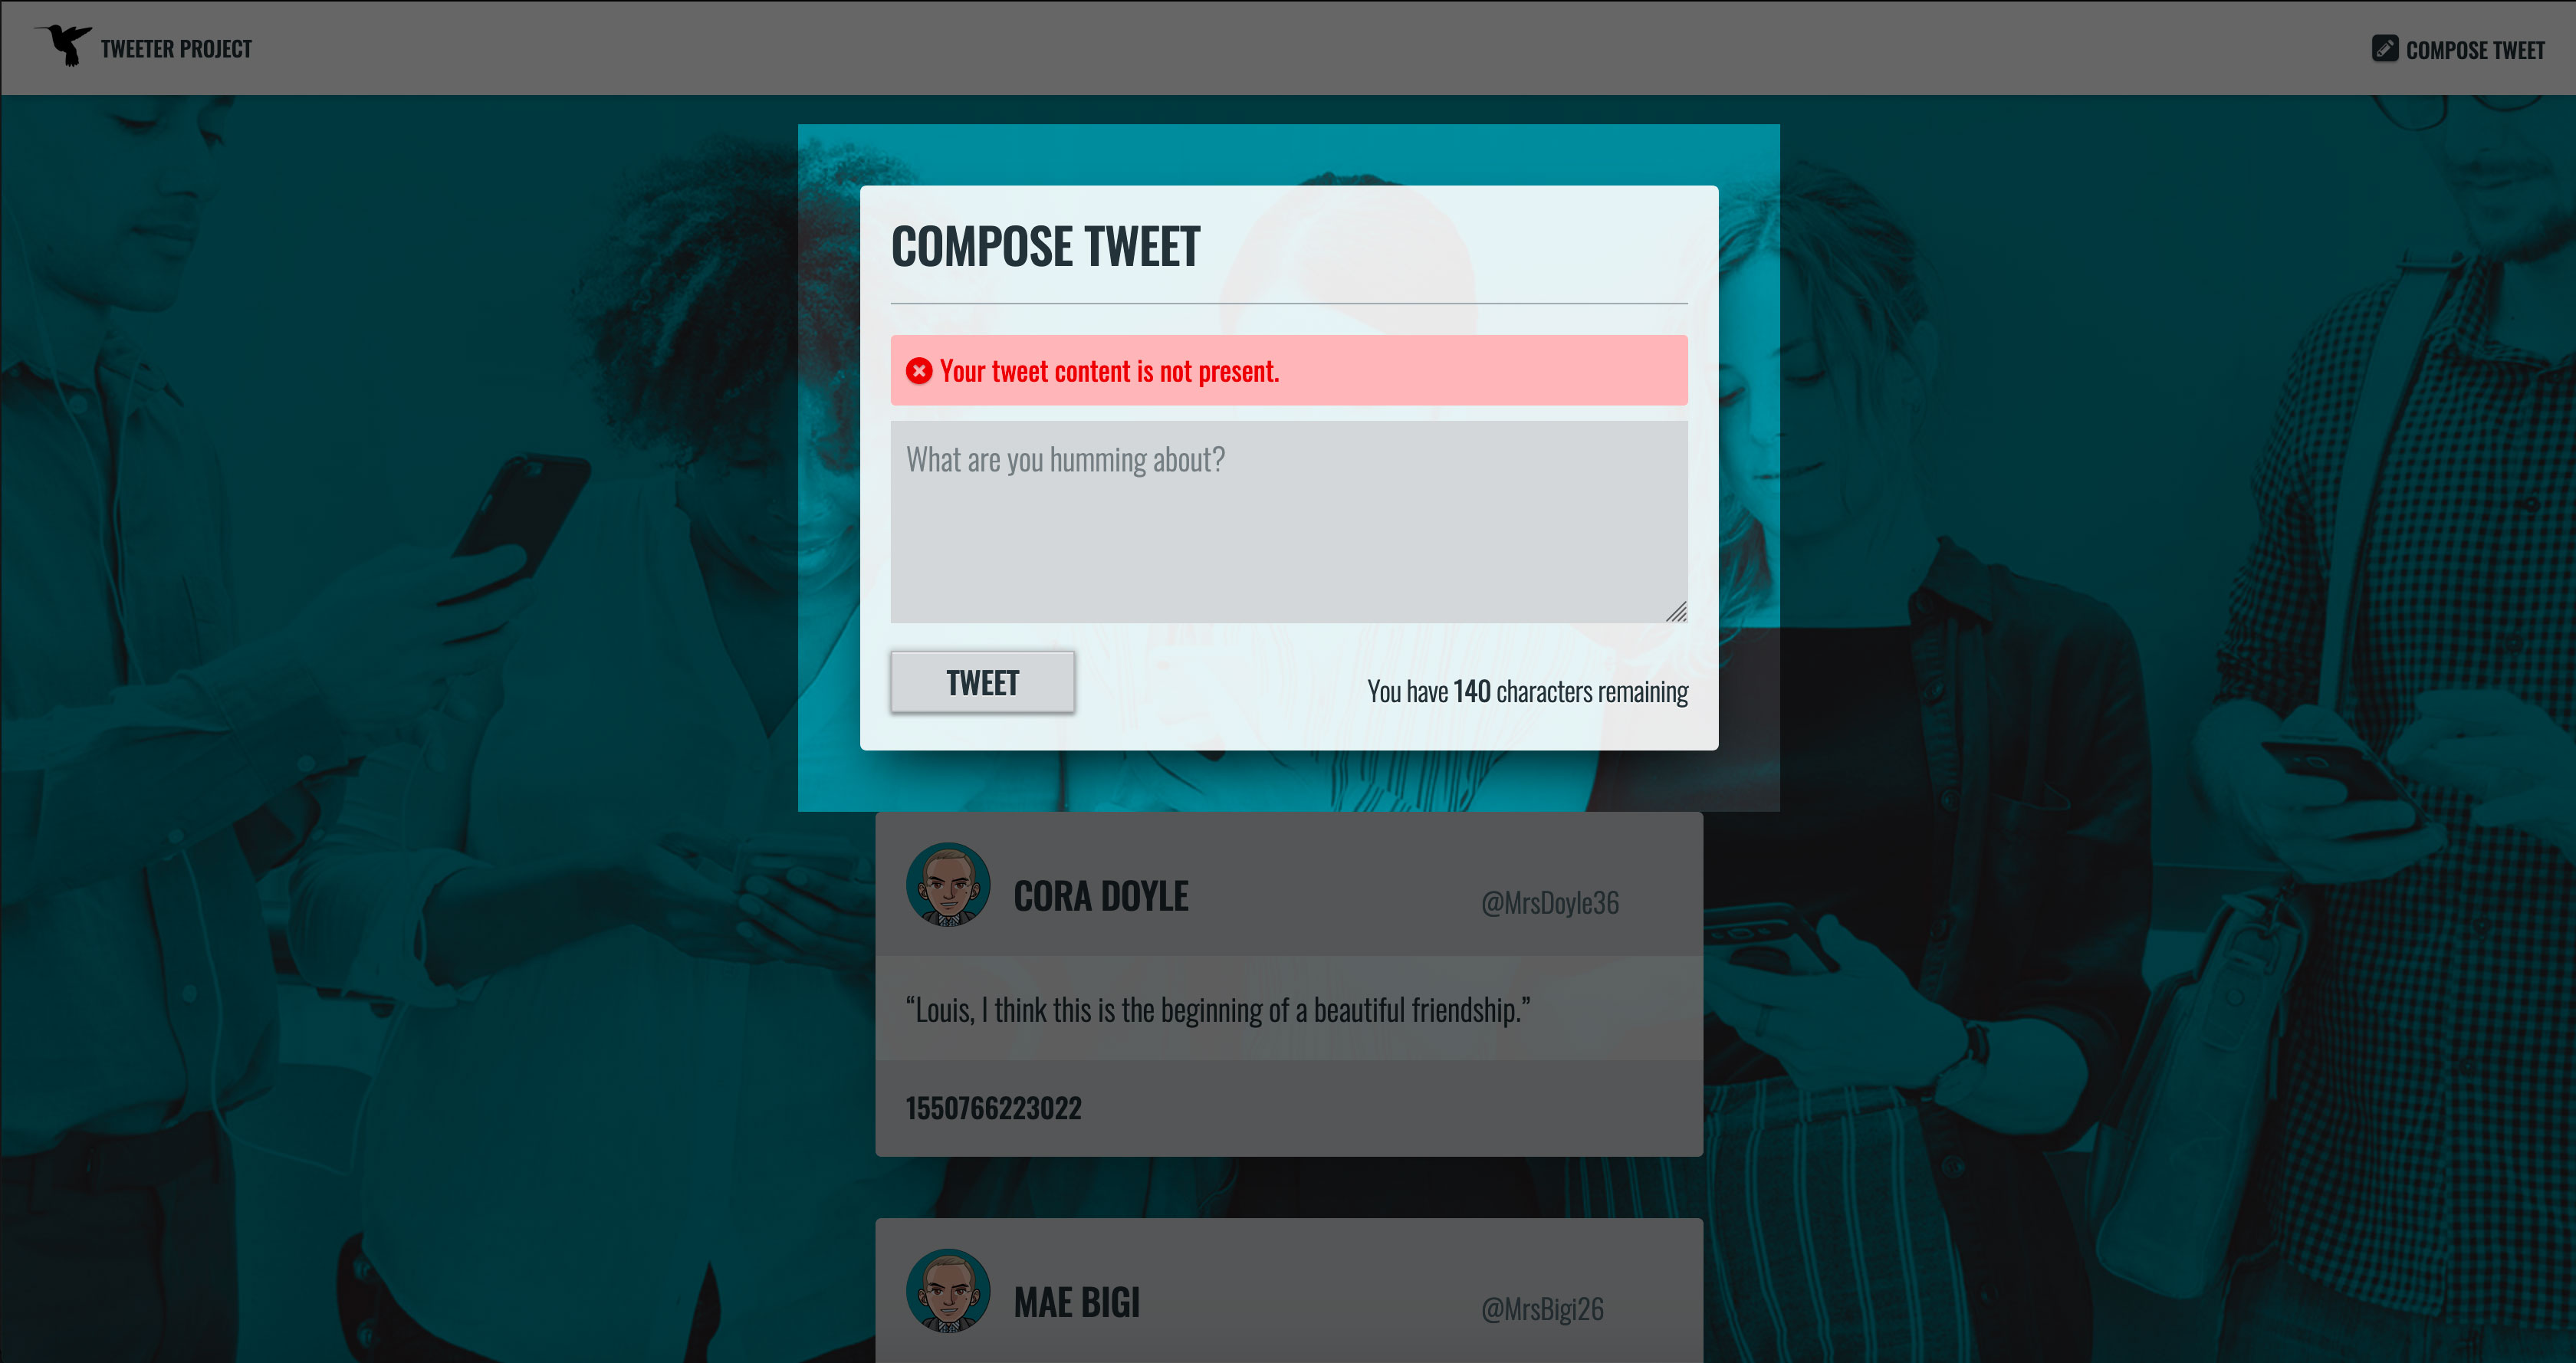 New Tweet, Web Form: Error Message, Content not Present